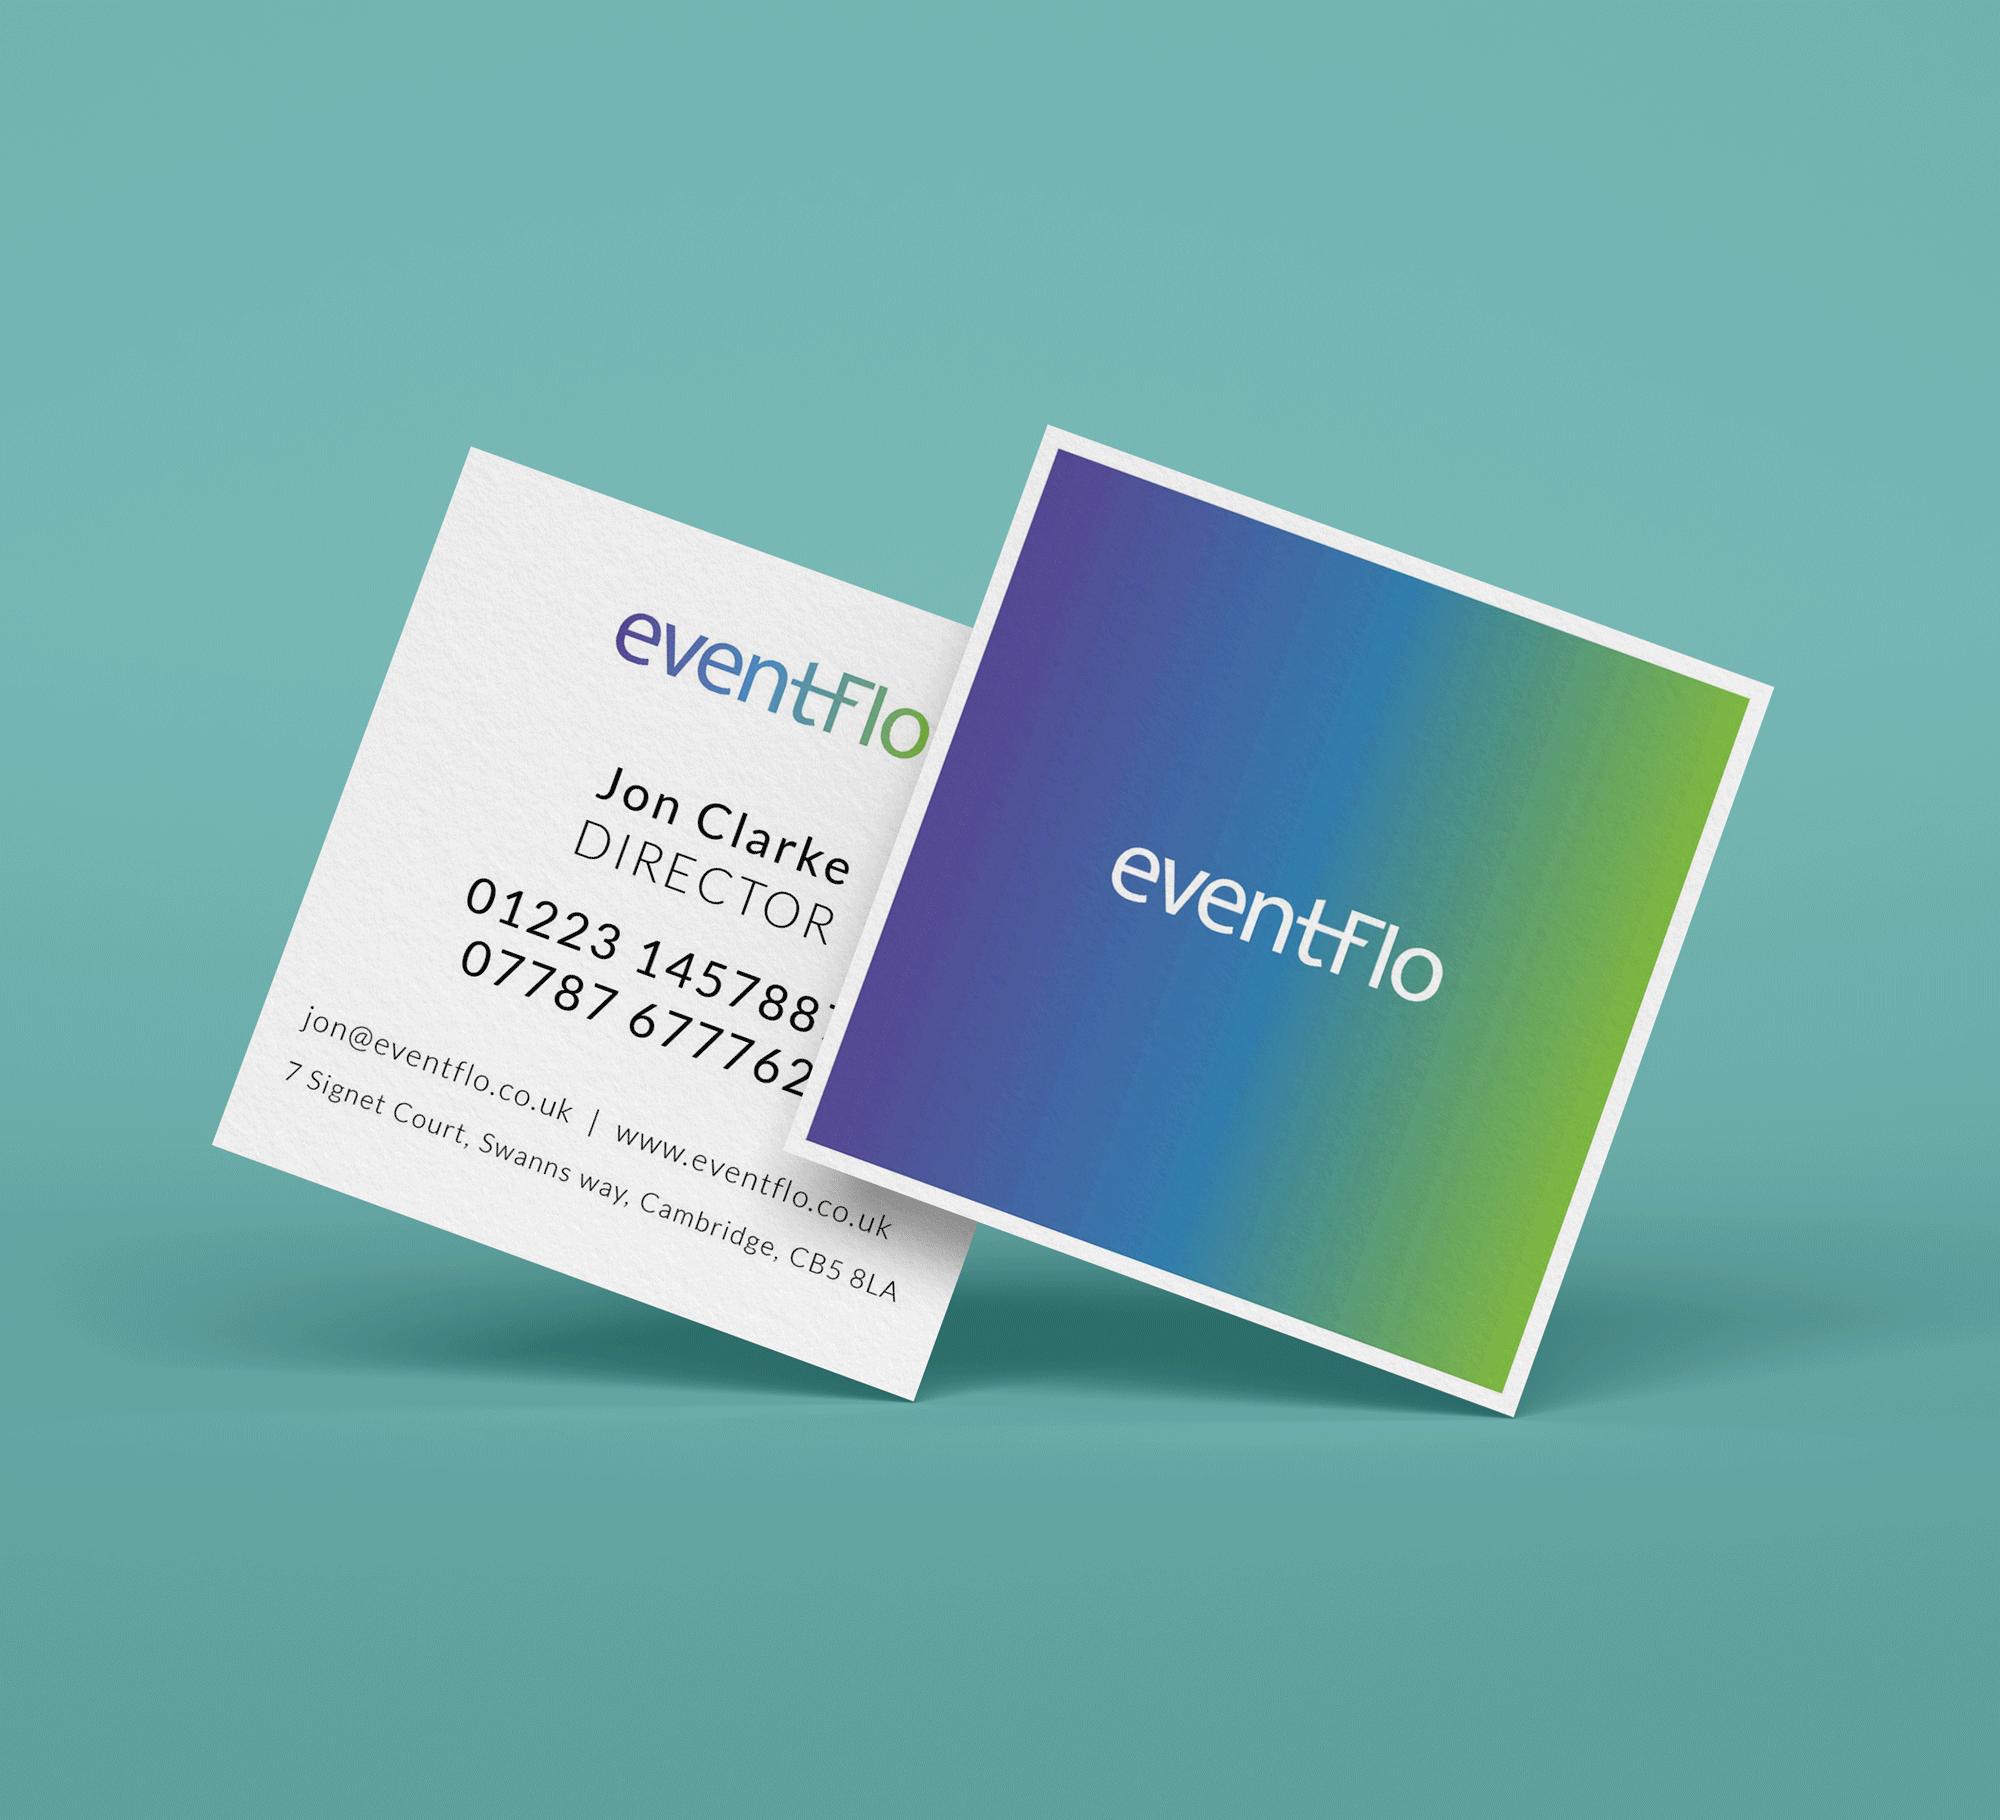 sq_cards_eventflo